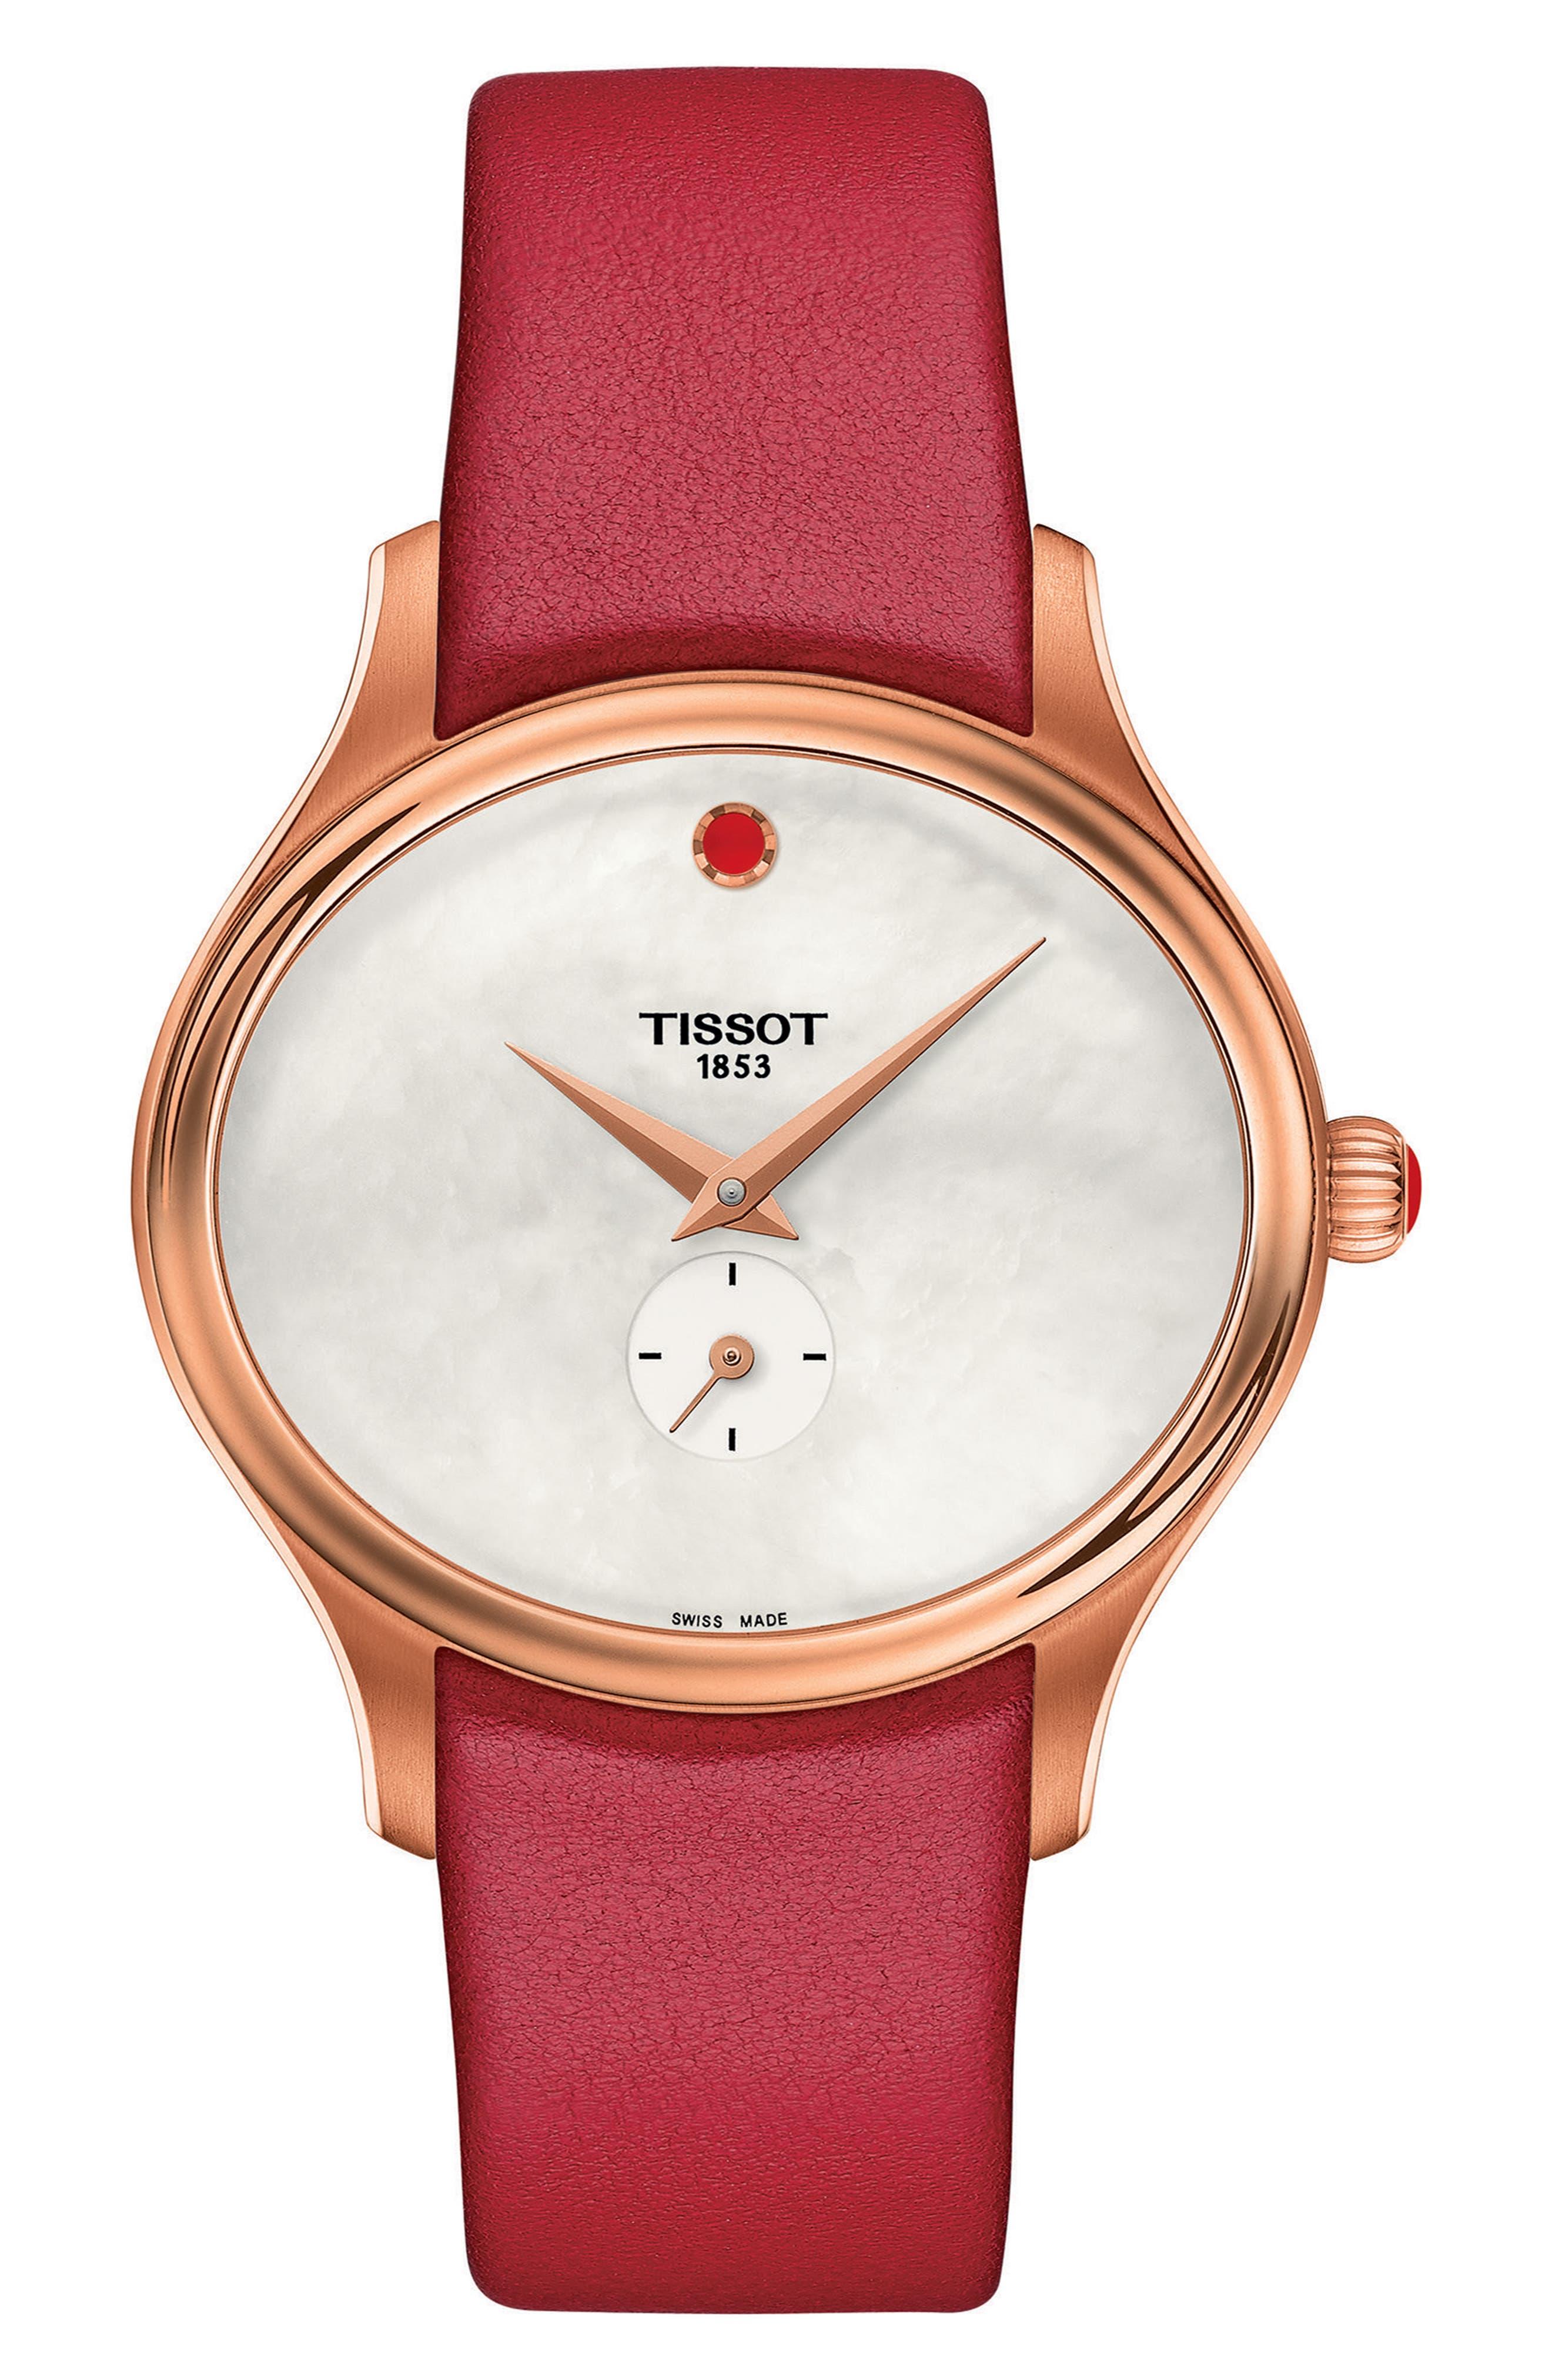 Tissot Bella Ora Leather Strap Watch, 28mm x 31mm